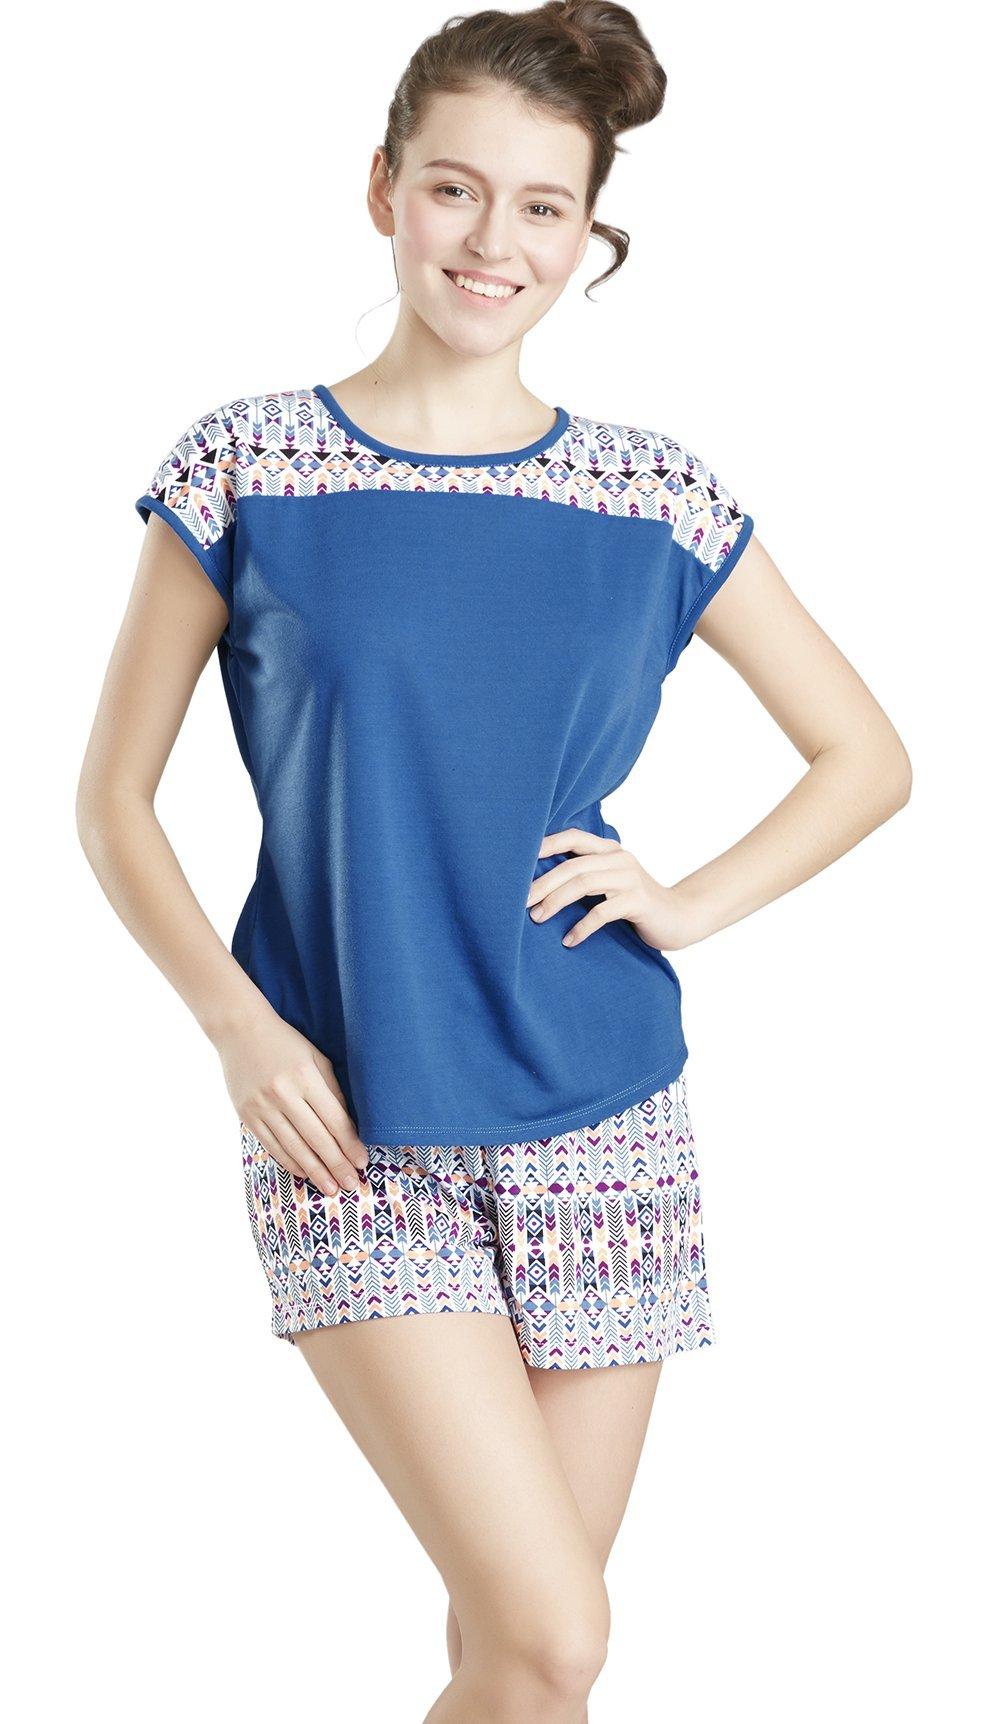 Summer Pajamas for Women - Short Sleeve Tee Shirt and Shorts Pajama Set for Women, Wander Print X-Large